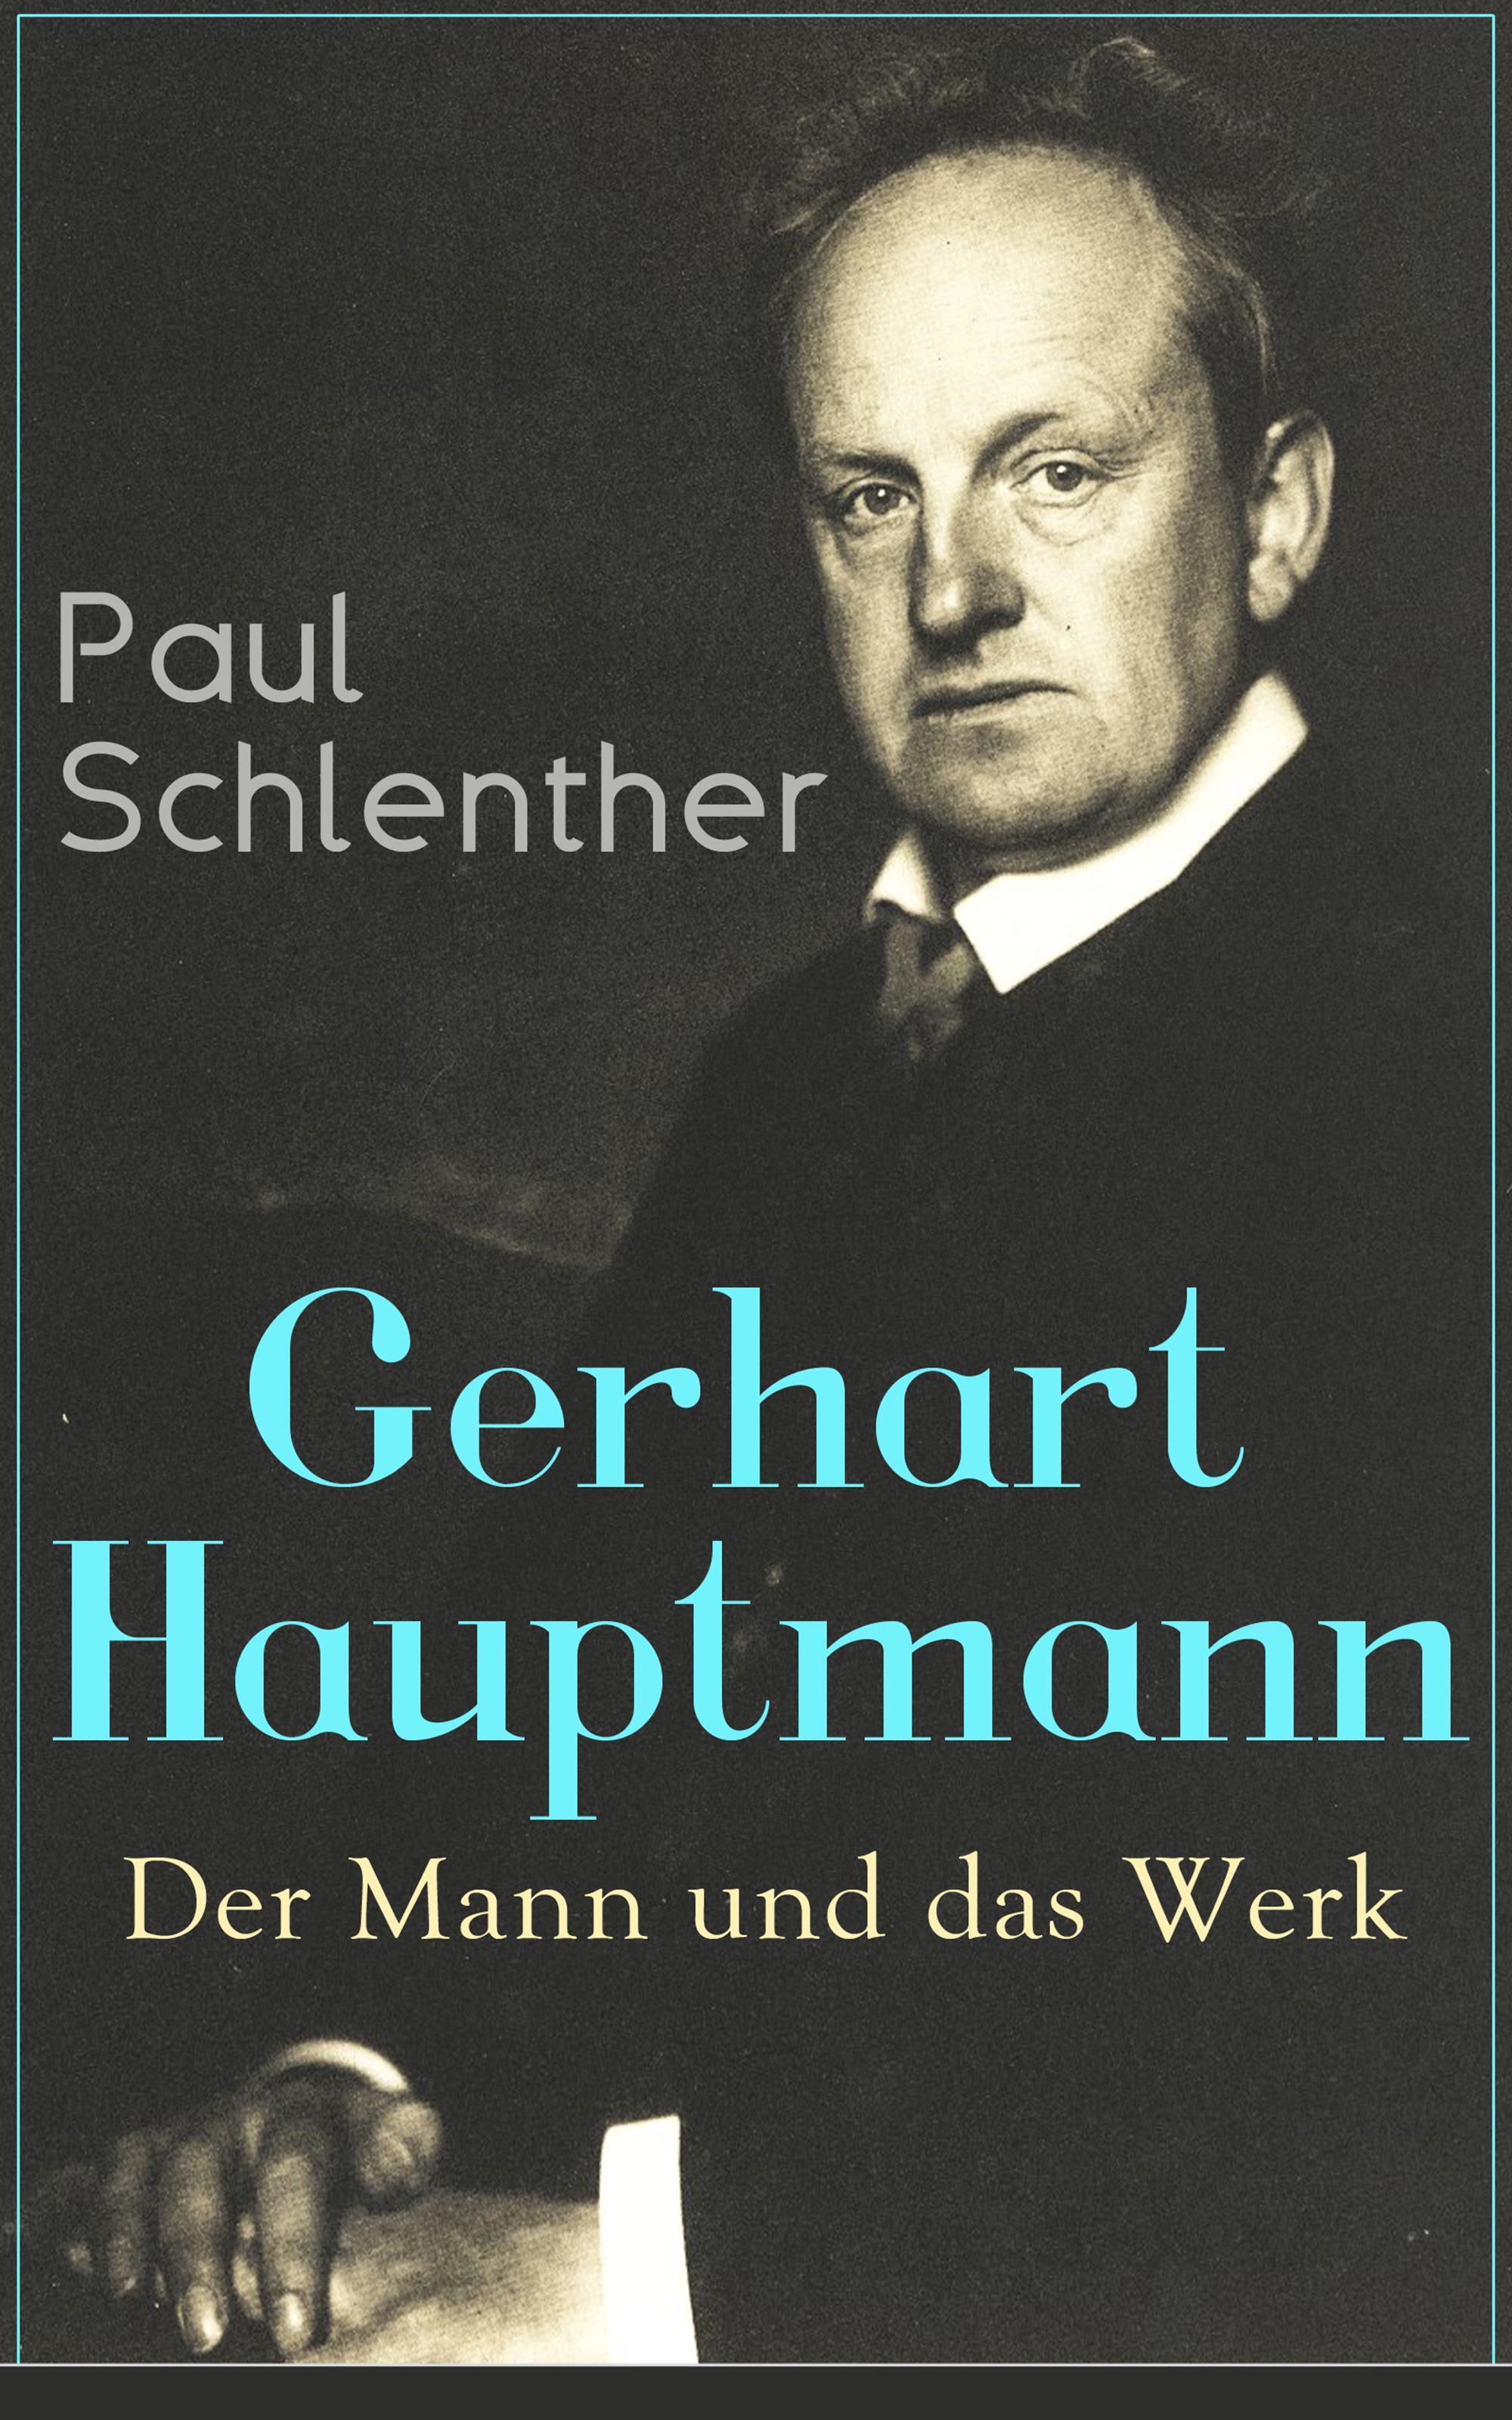 Paul Schlenther Gerhart Hauptmann: Der Mann und das Werk das r tsel mann das r tsel frau